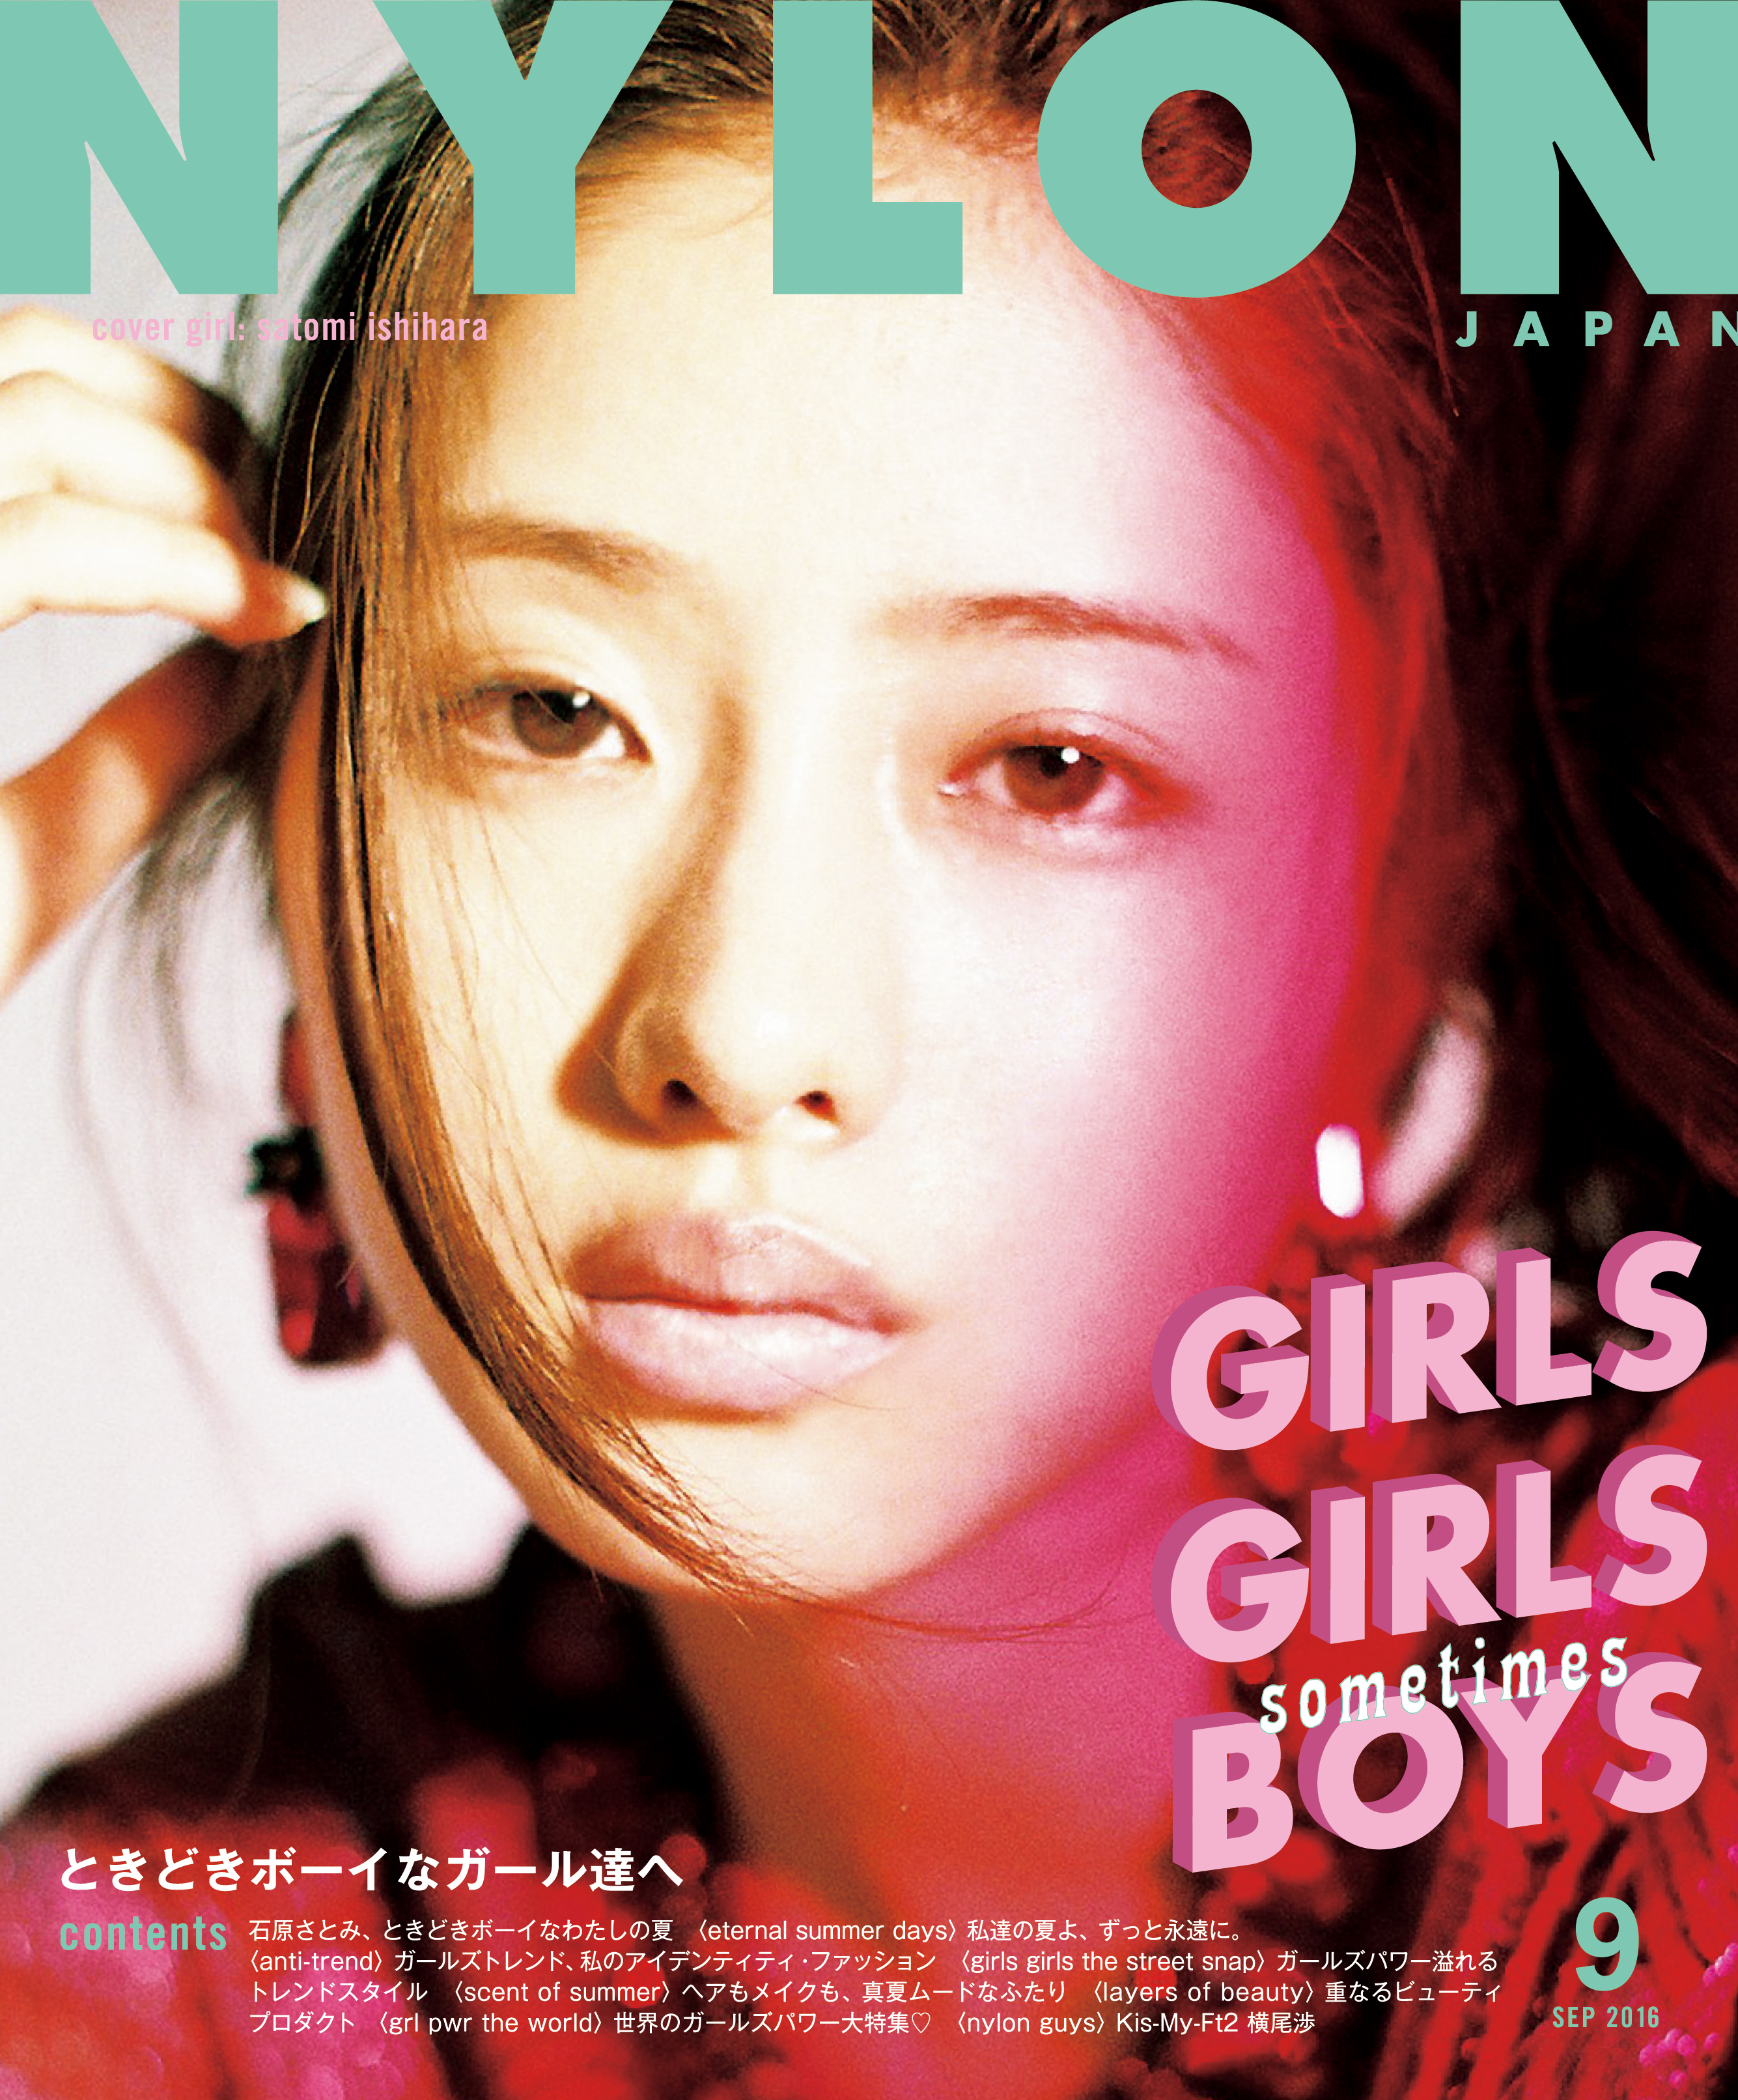 NYLONJAPAN9月号COVER